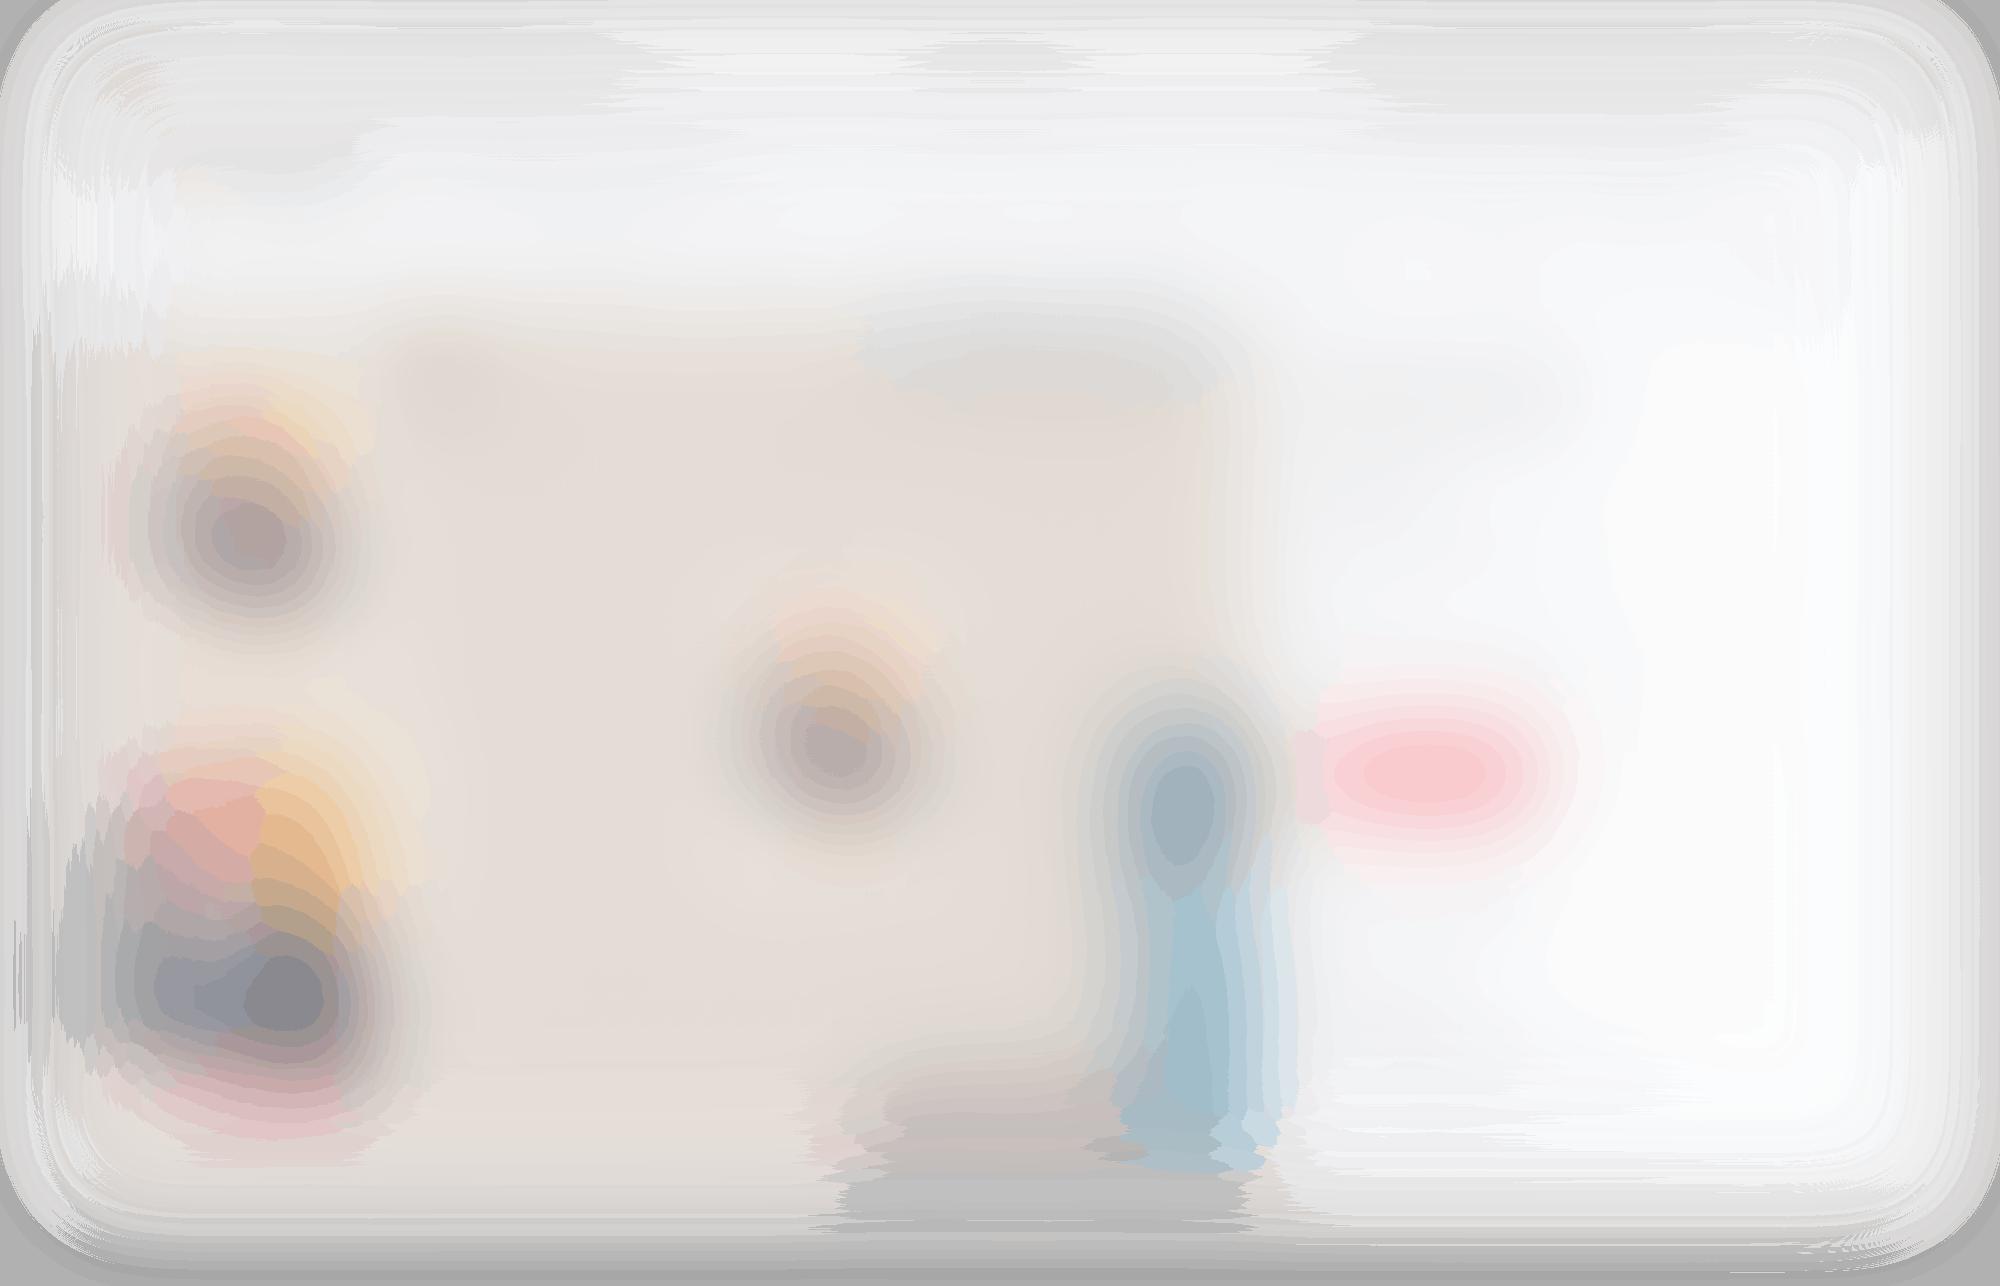 Screenshot 2020 09 29 at 09 47 55 autocompressfitresizeixlibphp 1 1 0max h2000max w3 D2000q80s5ce3c3cc83ba5776a629d247b14b77d5